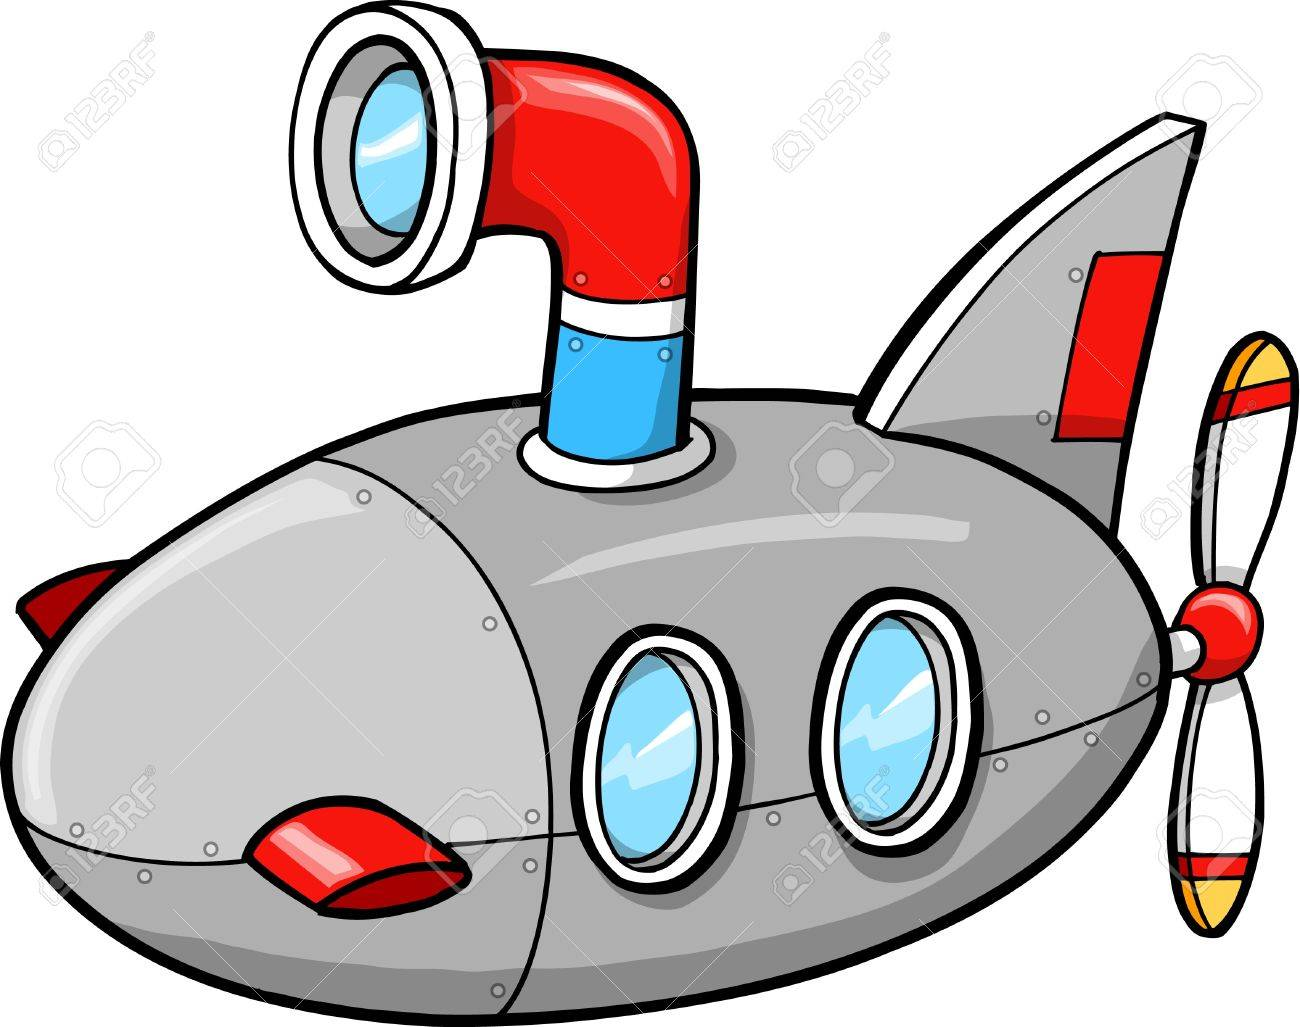 Cute Little Submarine Ship Vector Illustration - 11655584